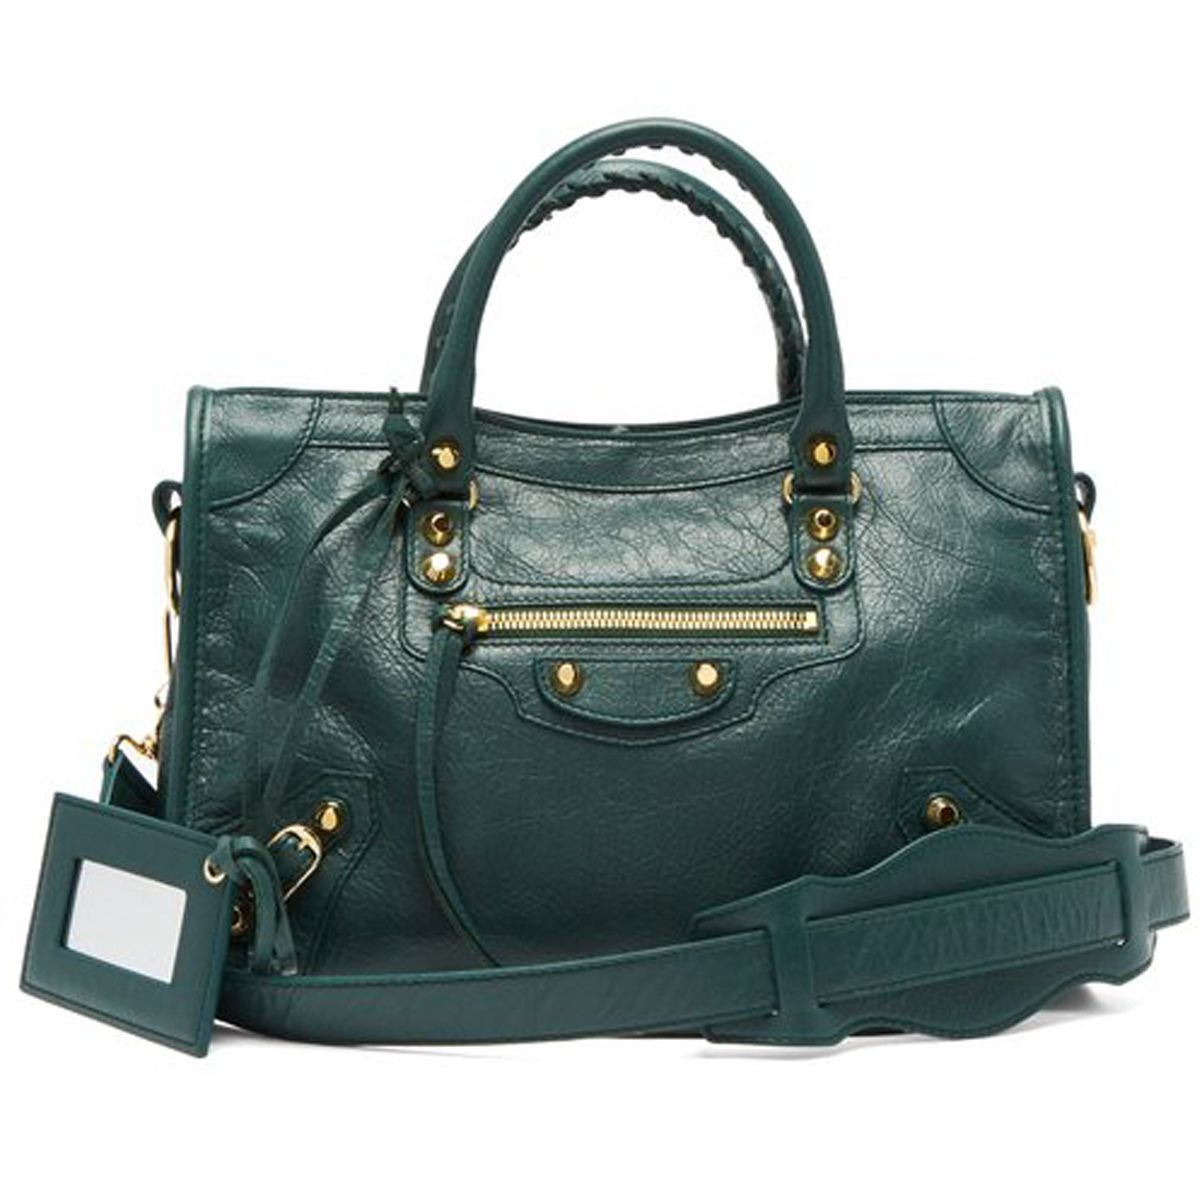 classic-designer-handbag-brands-271996-1541601289875-product.1200x0c.jpg (1200×1200)